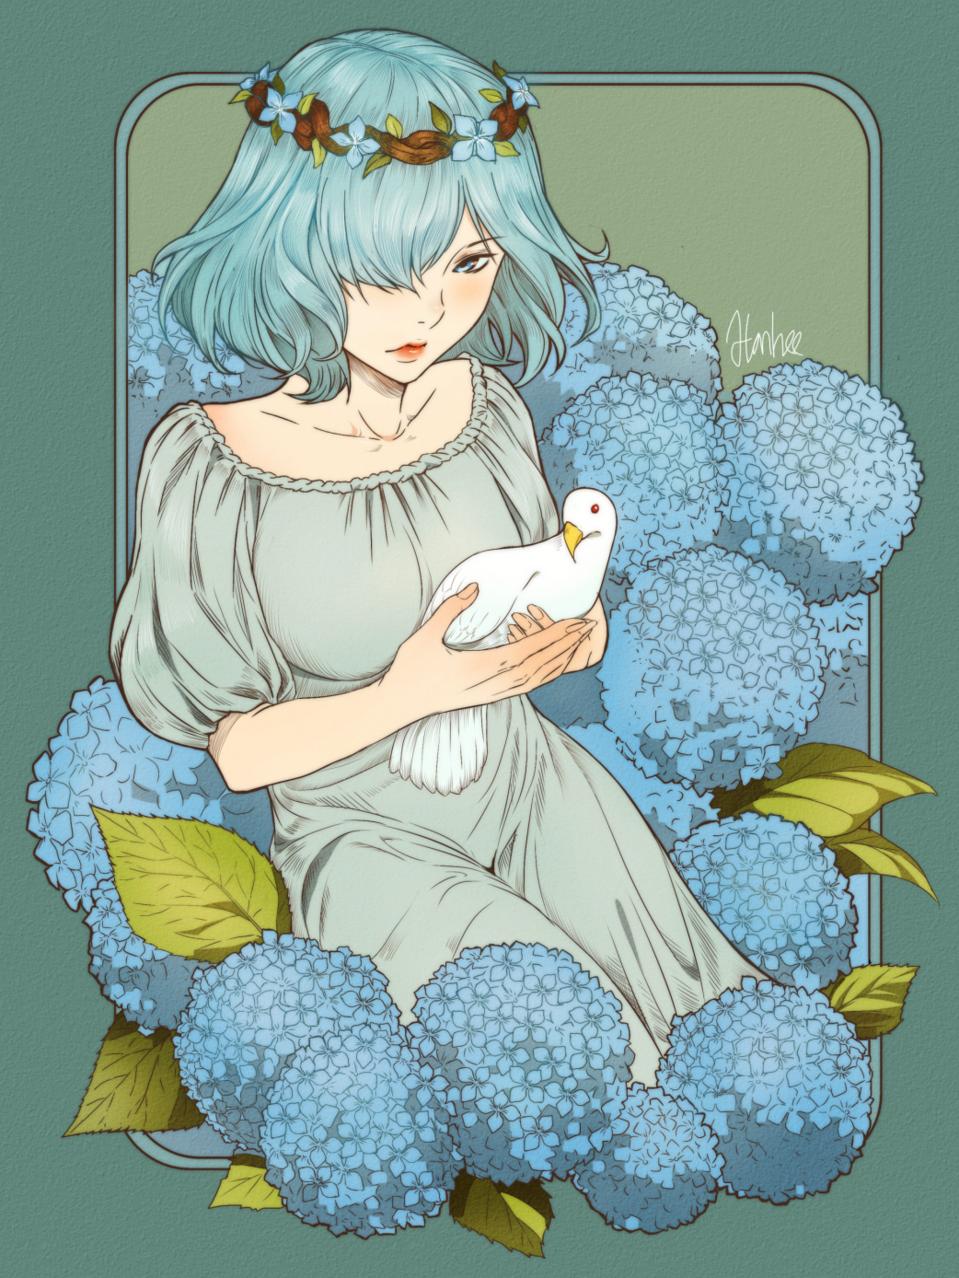 hortensia Illust of Hanheebin medibangpaint anime hortensia girl pretty kawaii cute illustration hydrangea flower